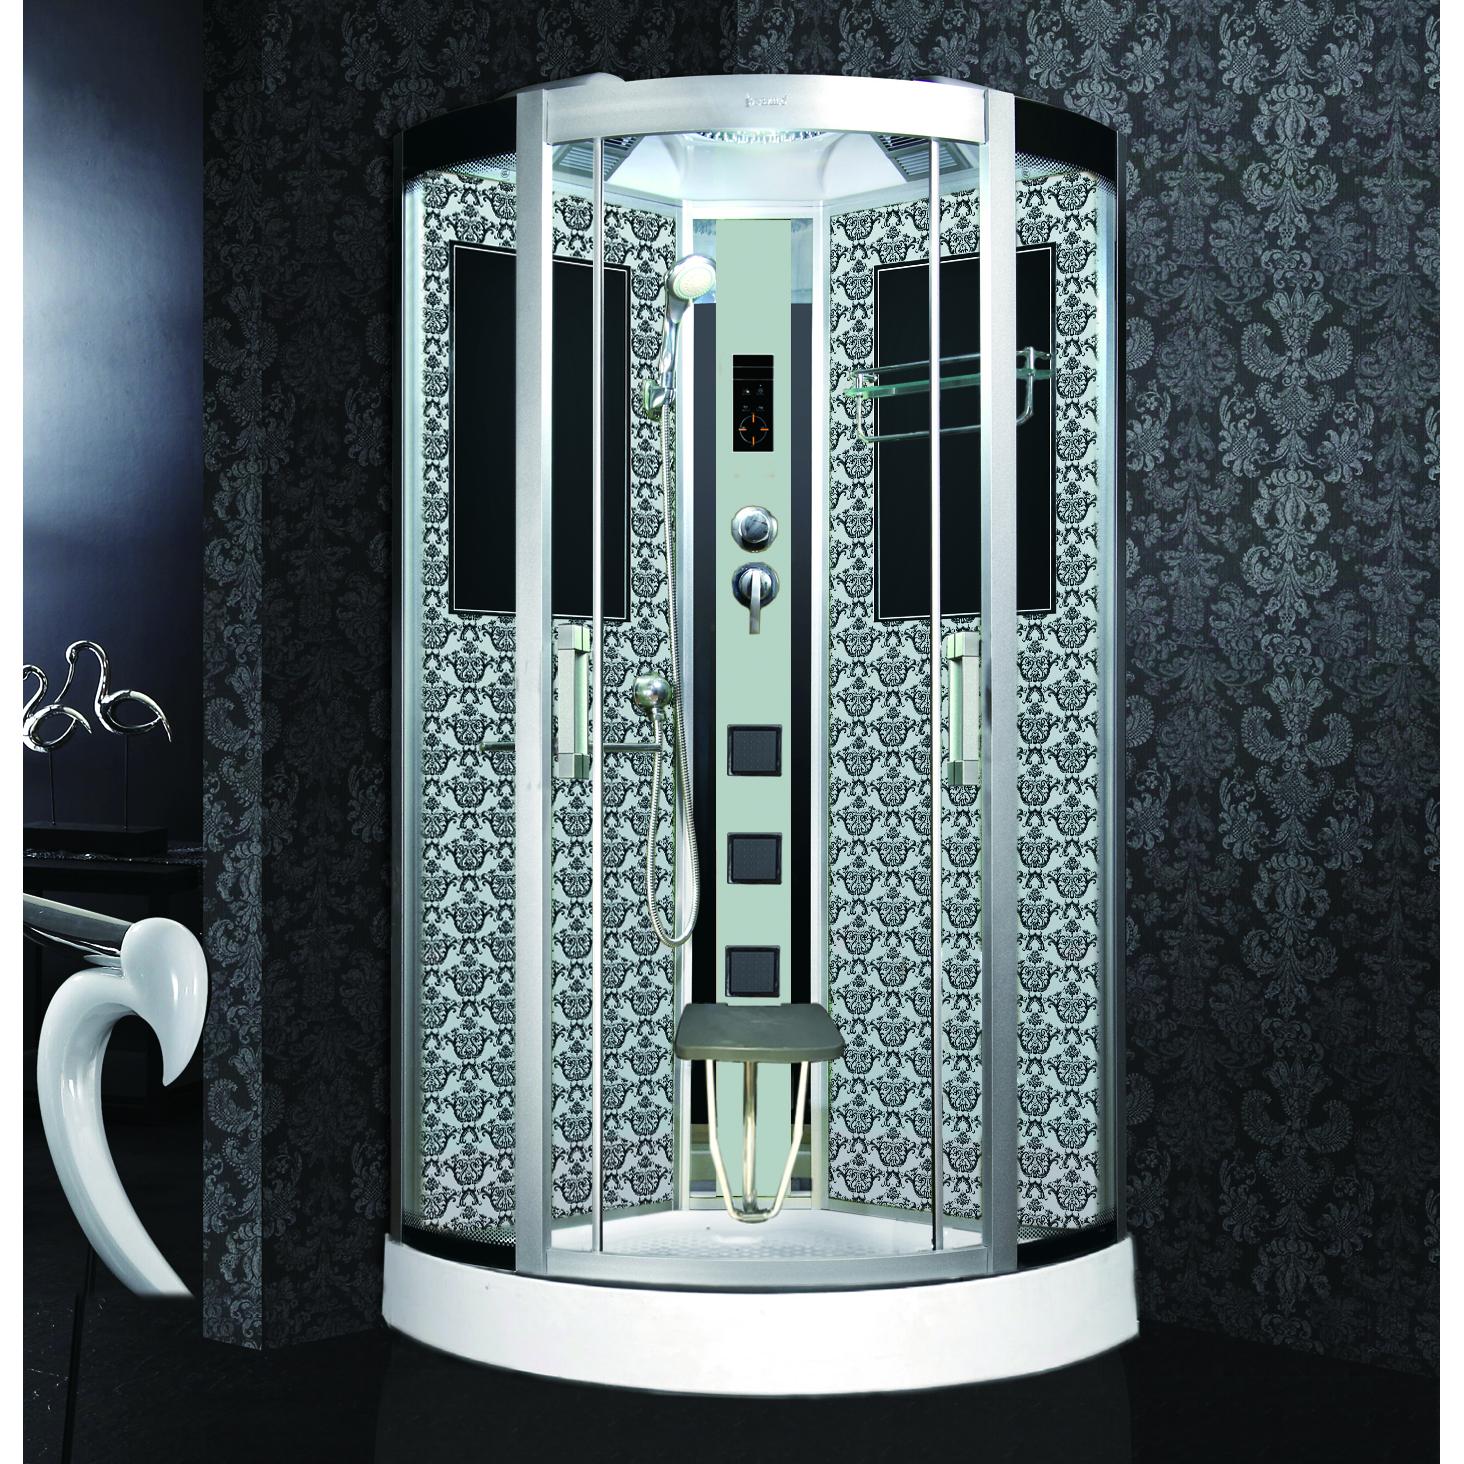 Душевая кабина Niagara Lux 7715W белый душевая кабина mirwell 120x80x215 см mr4512tpl c1